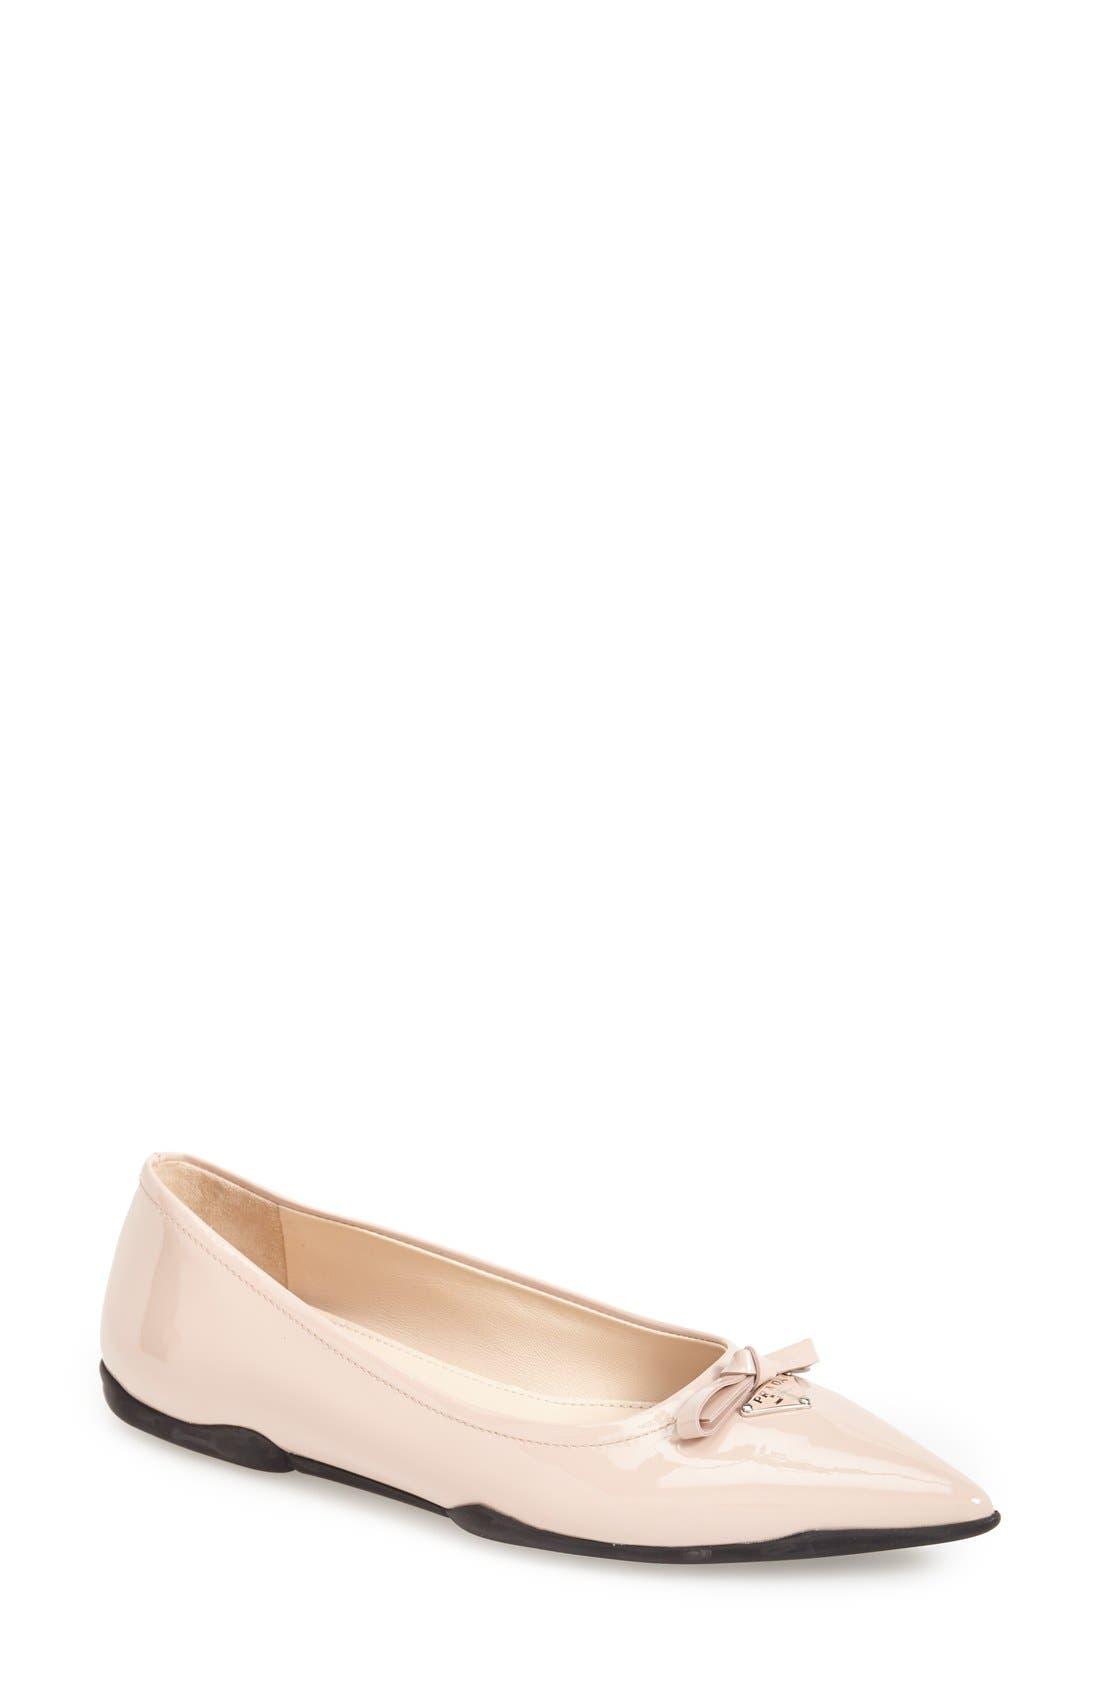 Main Image - Prada Pointy Toe Flat (Women)